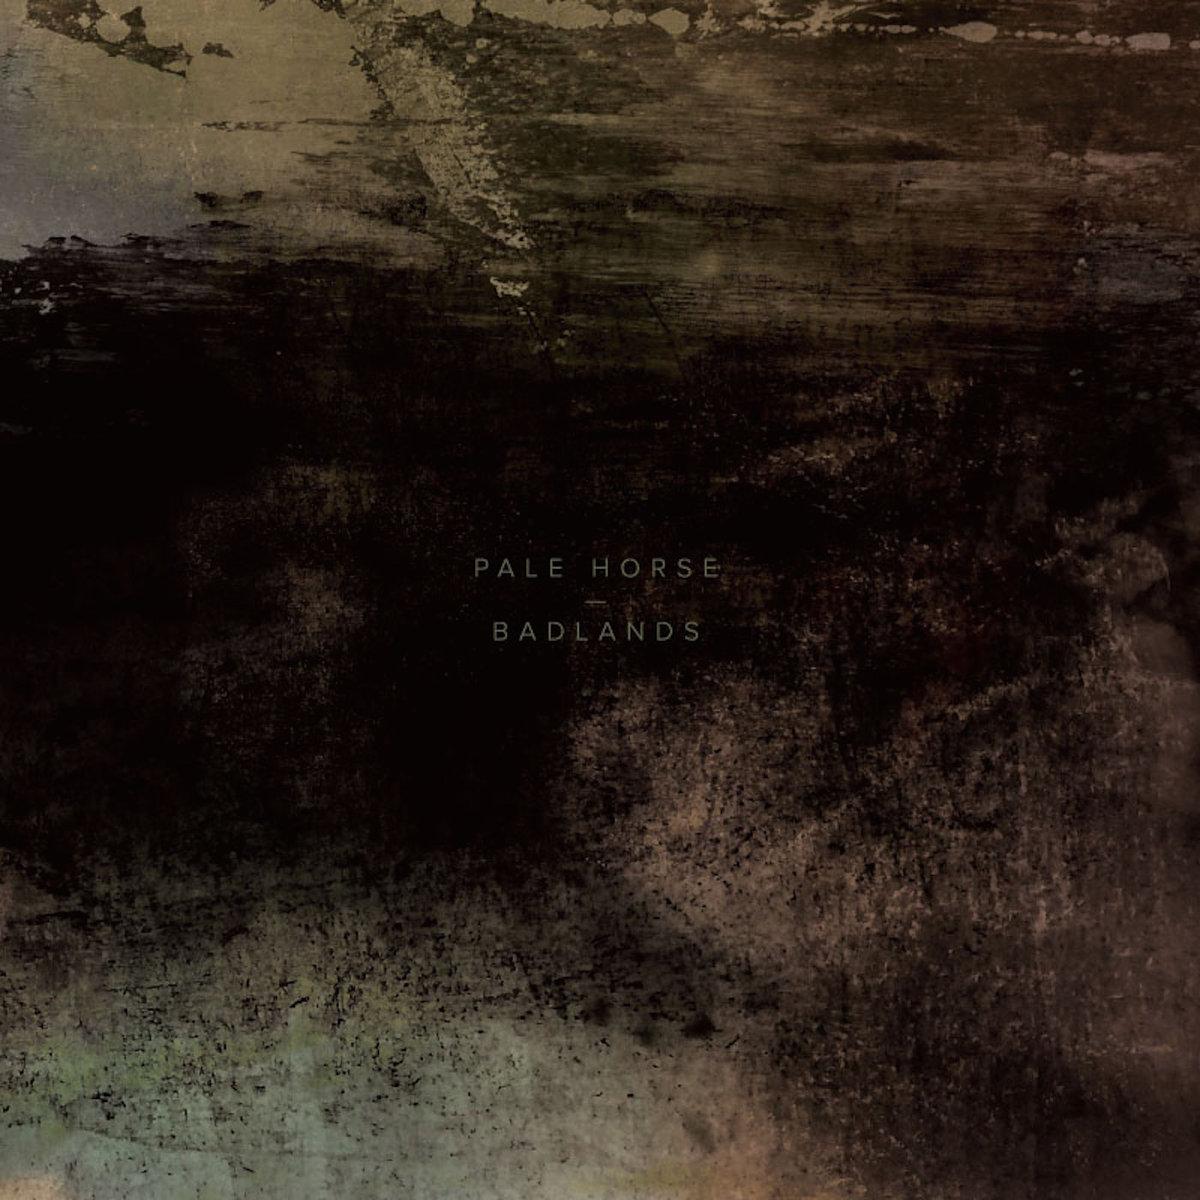 Review: Jeremiah Cymerman's Pale Horse – Badlands